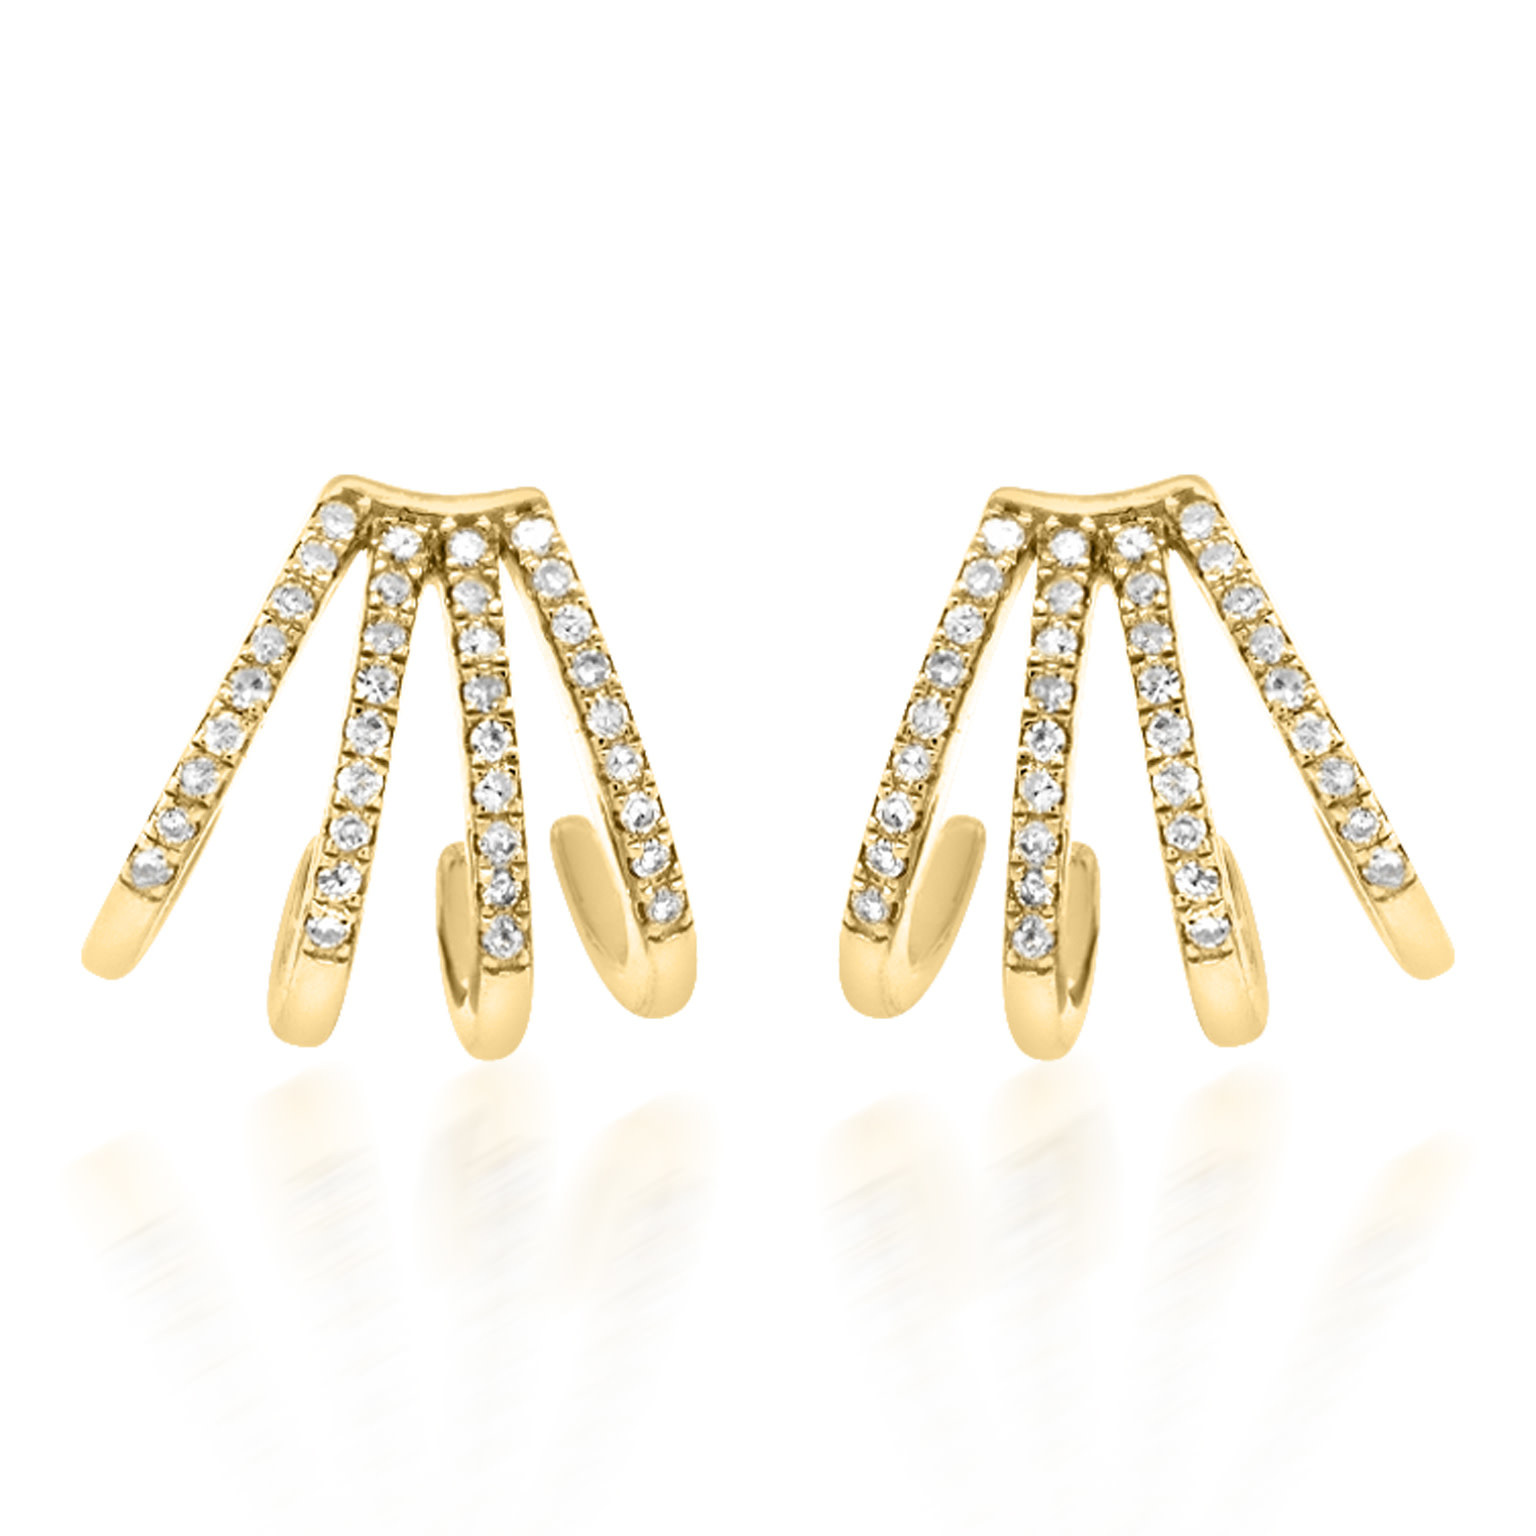 Trabert Goldsmiths Pave Diamond Cuff Huggie Hoop Earrings